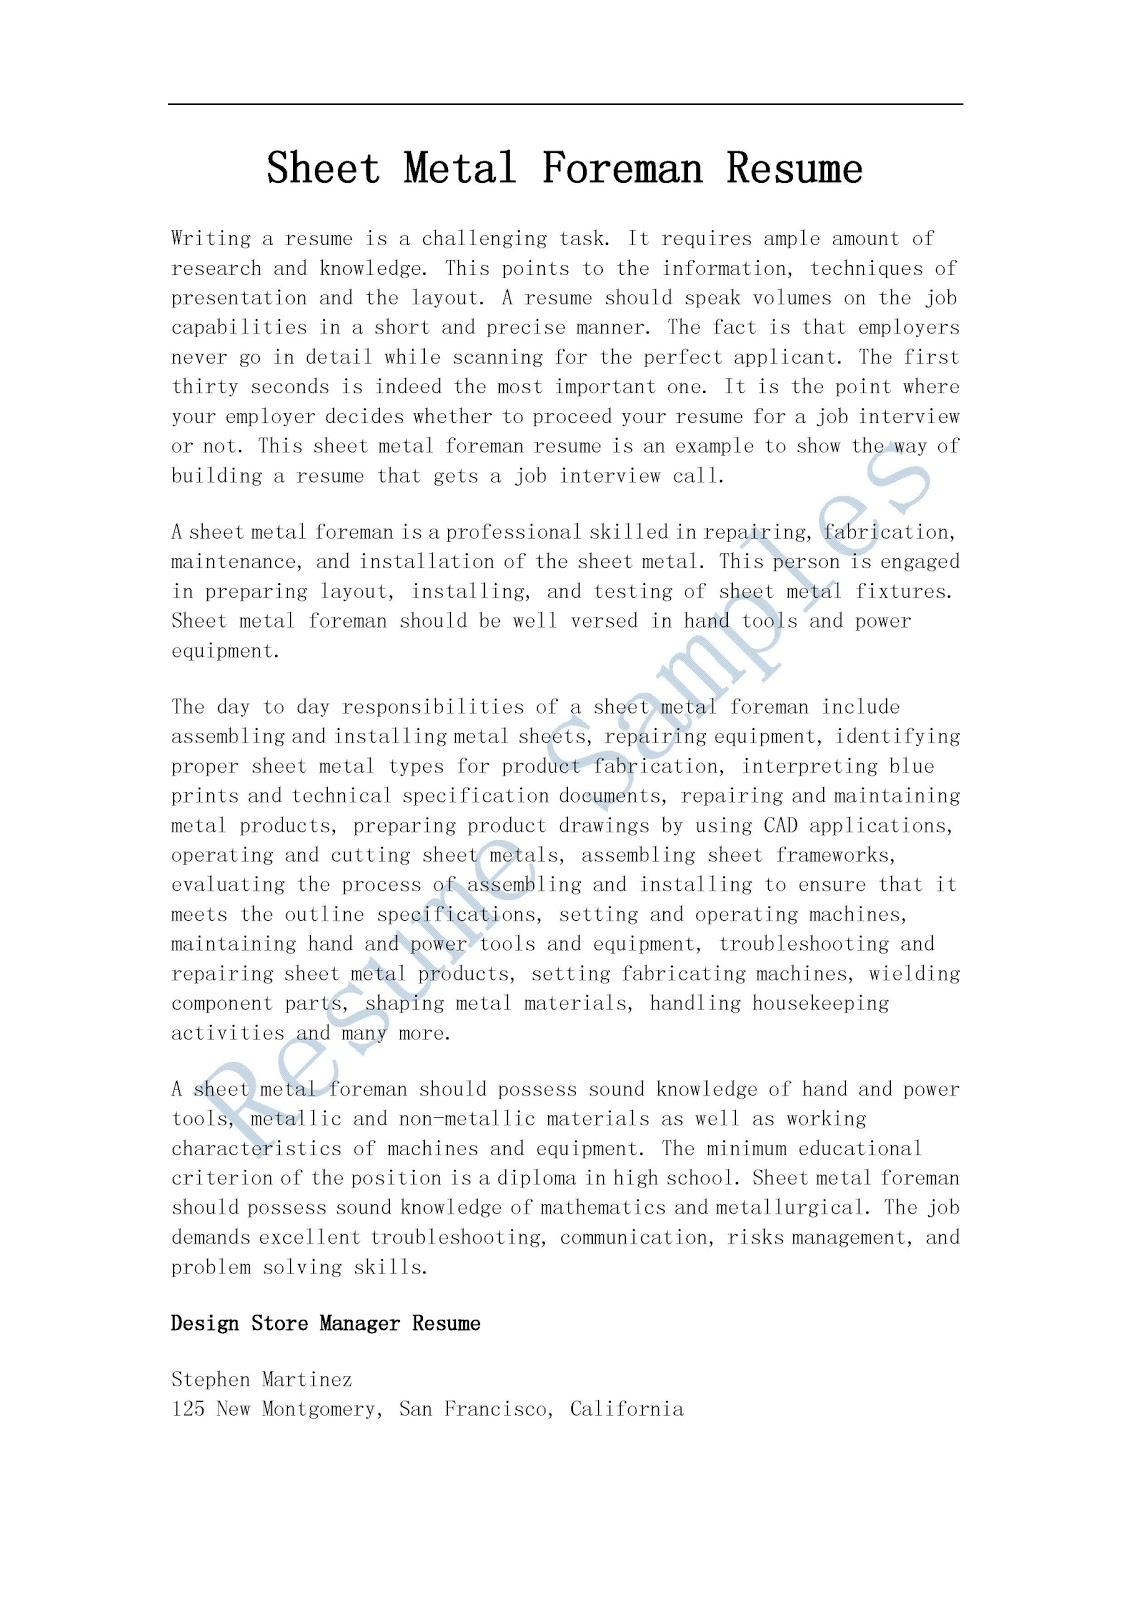 Sheet Metal Foreman Wanted Skilled Trades Artisan Resume Samples Sheet Metal Foreman Resume